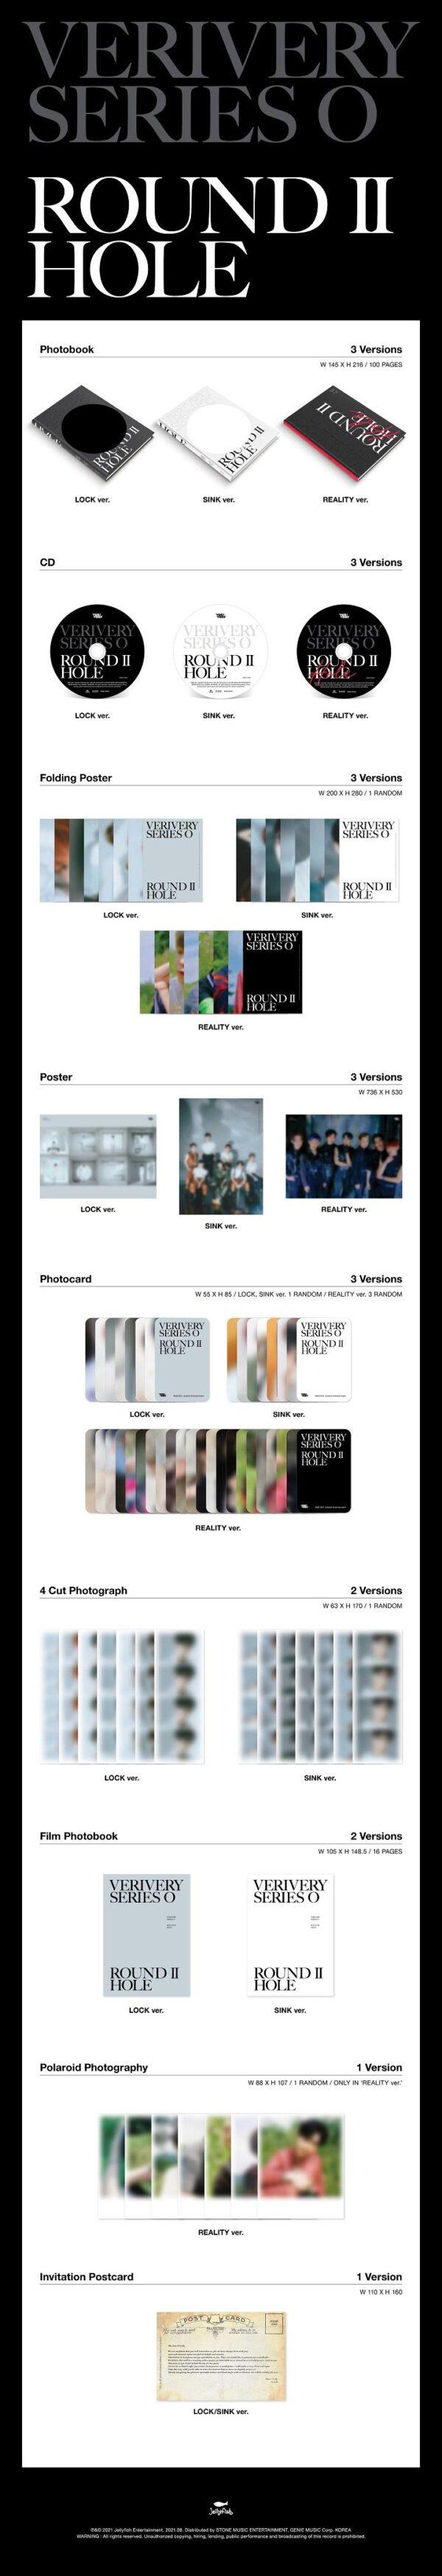 6th Mini Album de VERIVERY SERIES 'O ROUND 2 HOLE LOCK Ver SINK Ver o REALITY Ver. Disponibles